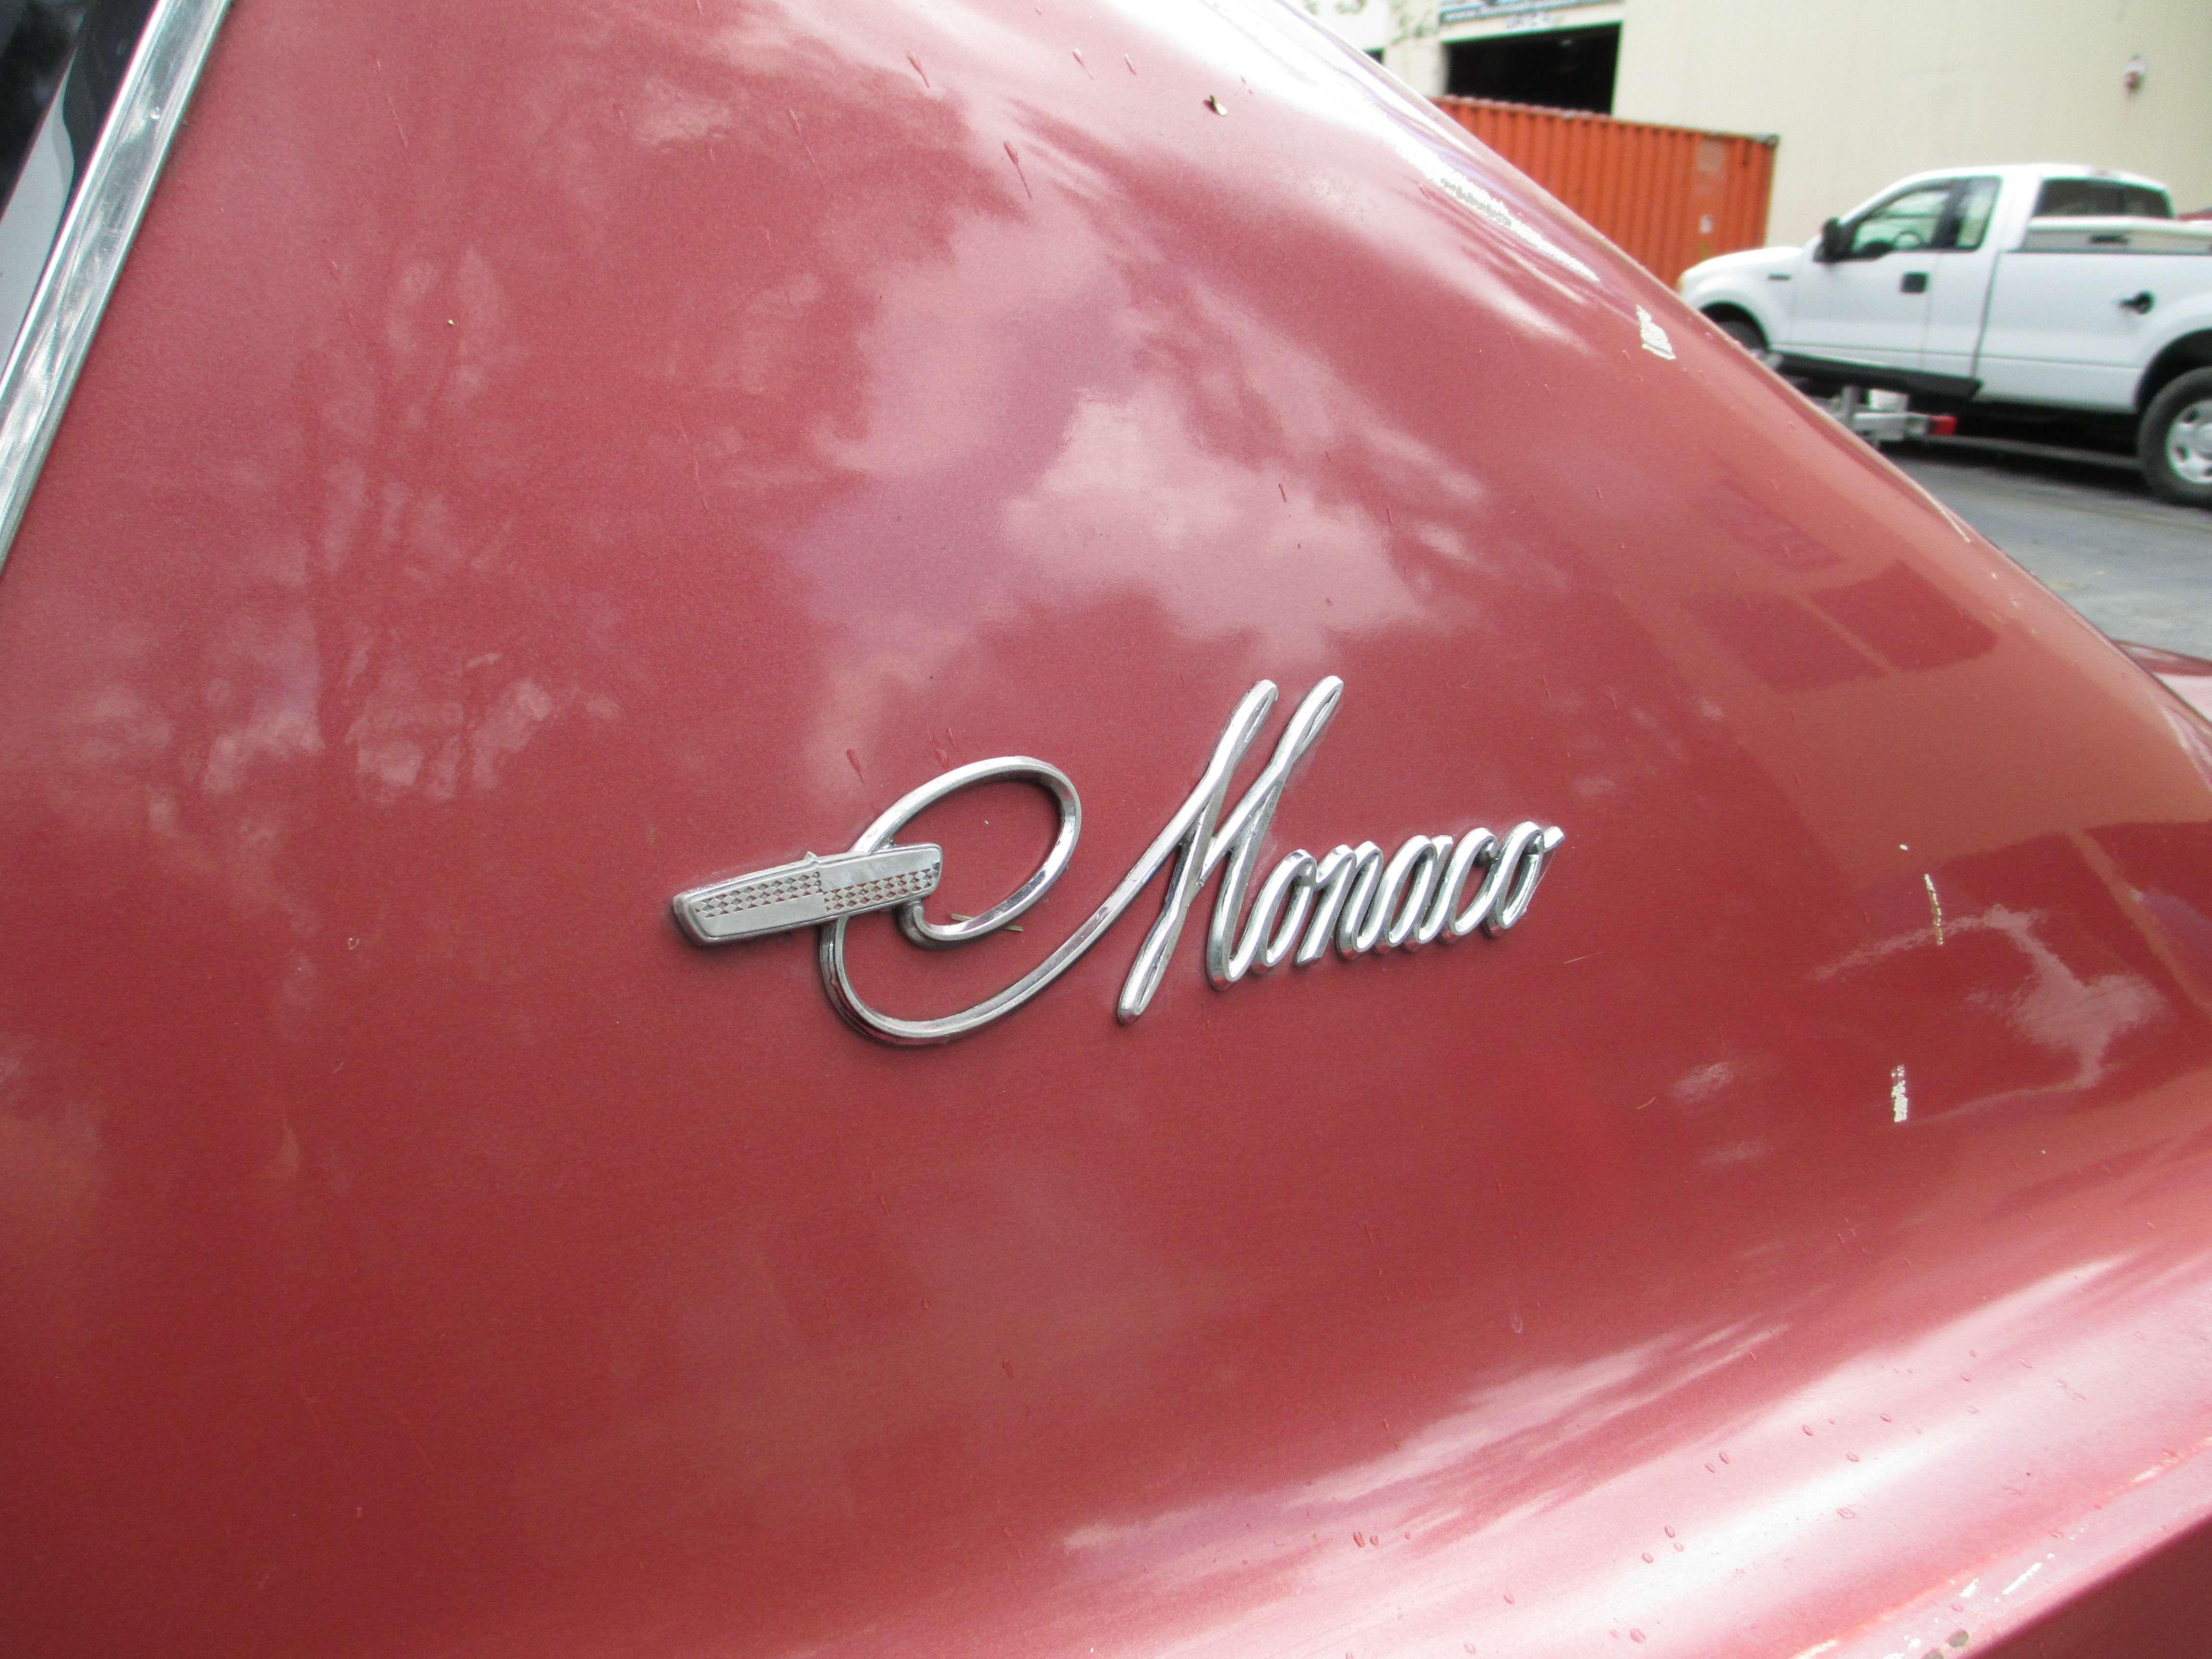 Used 1967 Dodge Monaco for Sale ($5,900) at Miami, FL | Used